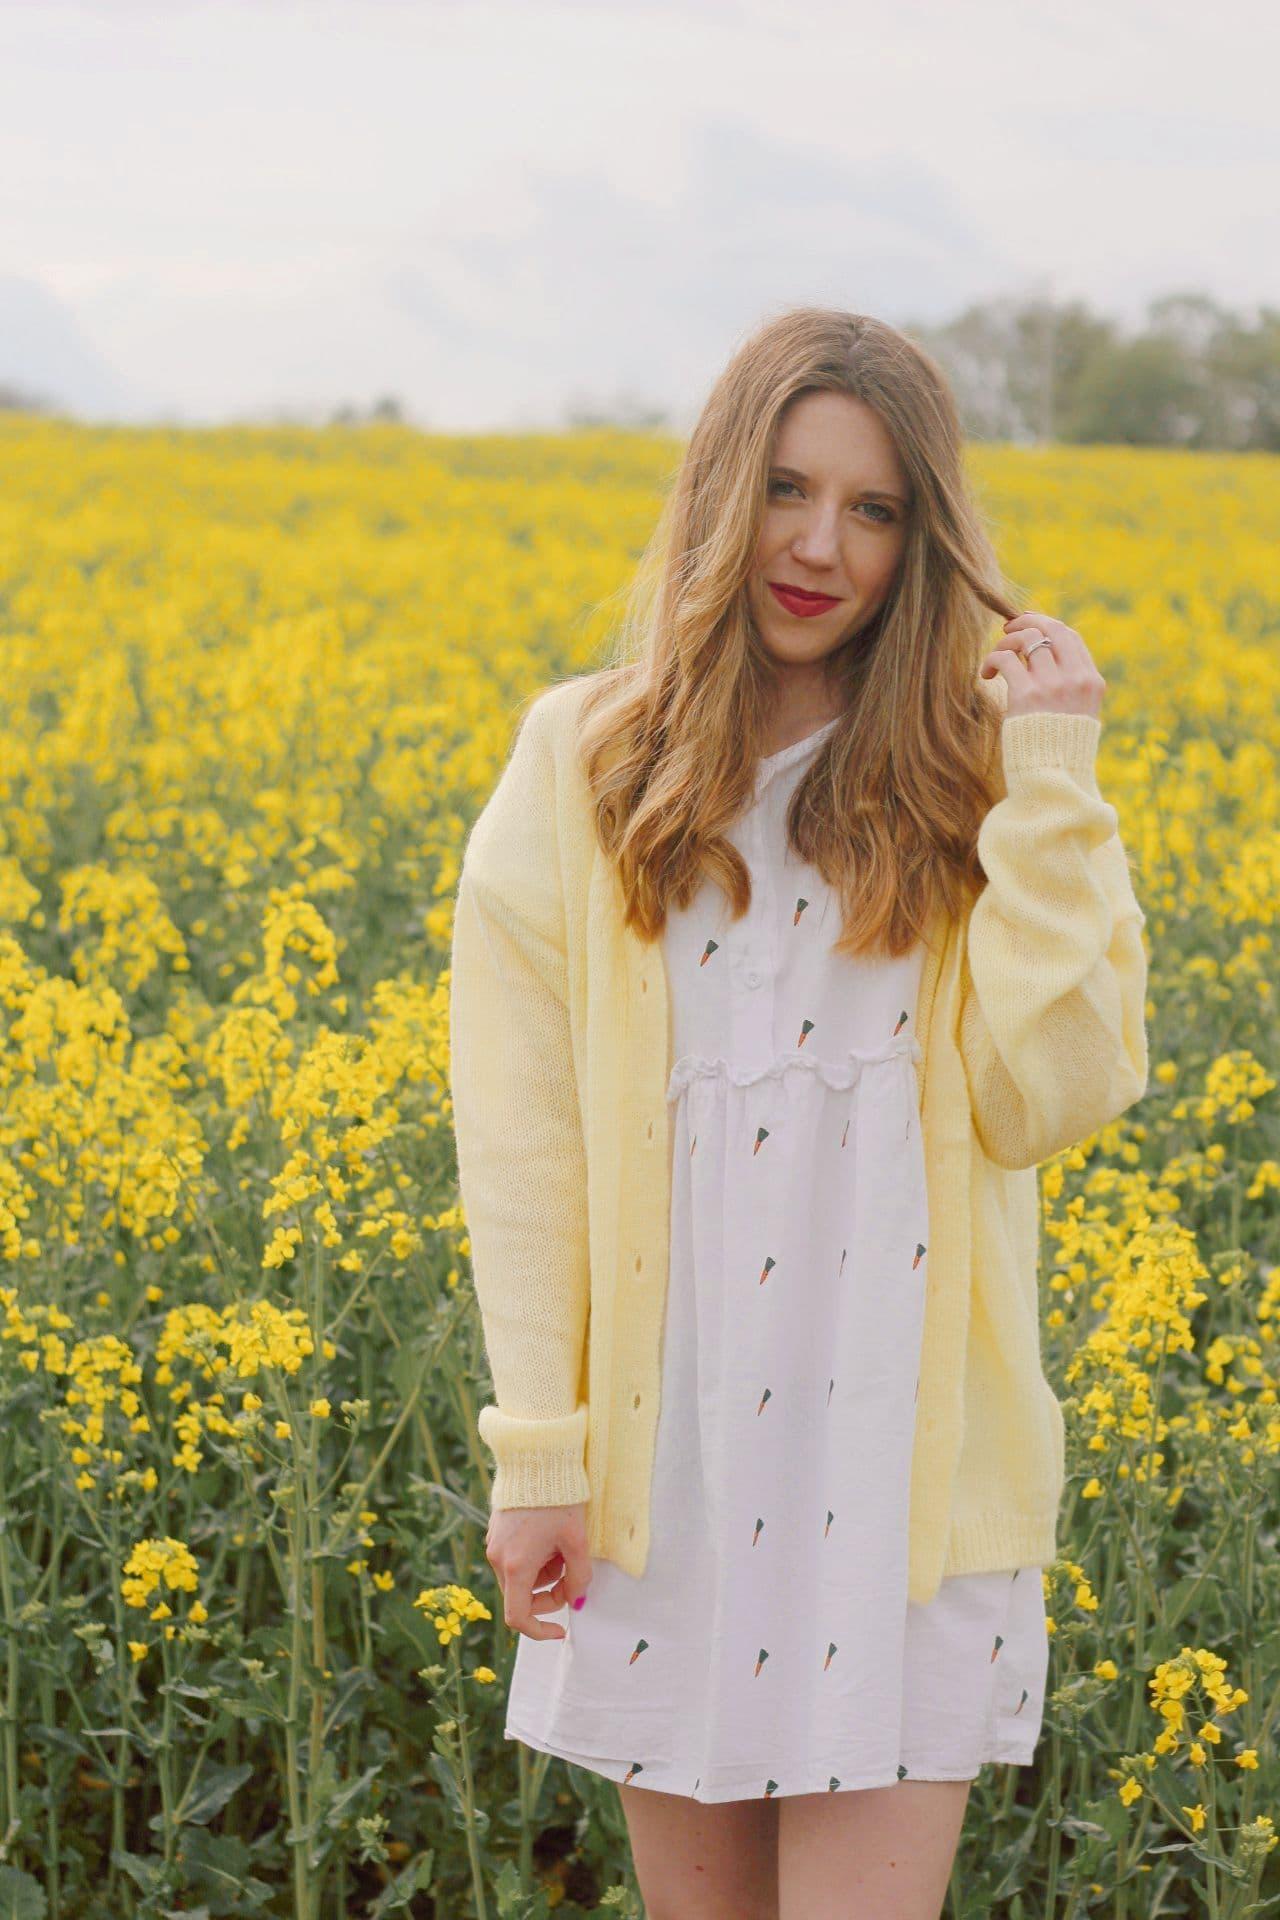 Shein spring dress